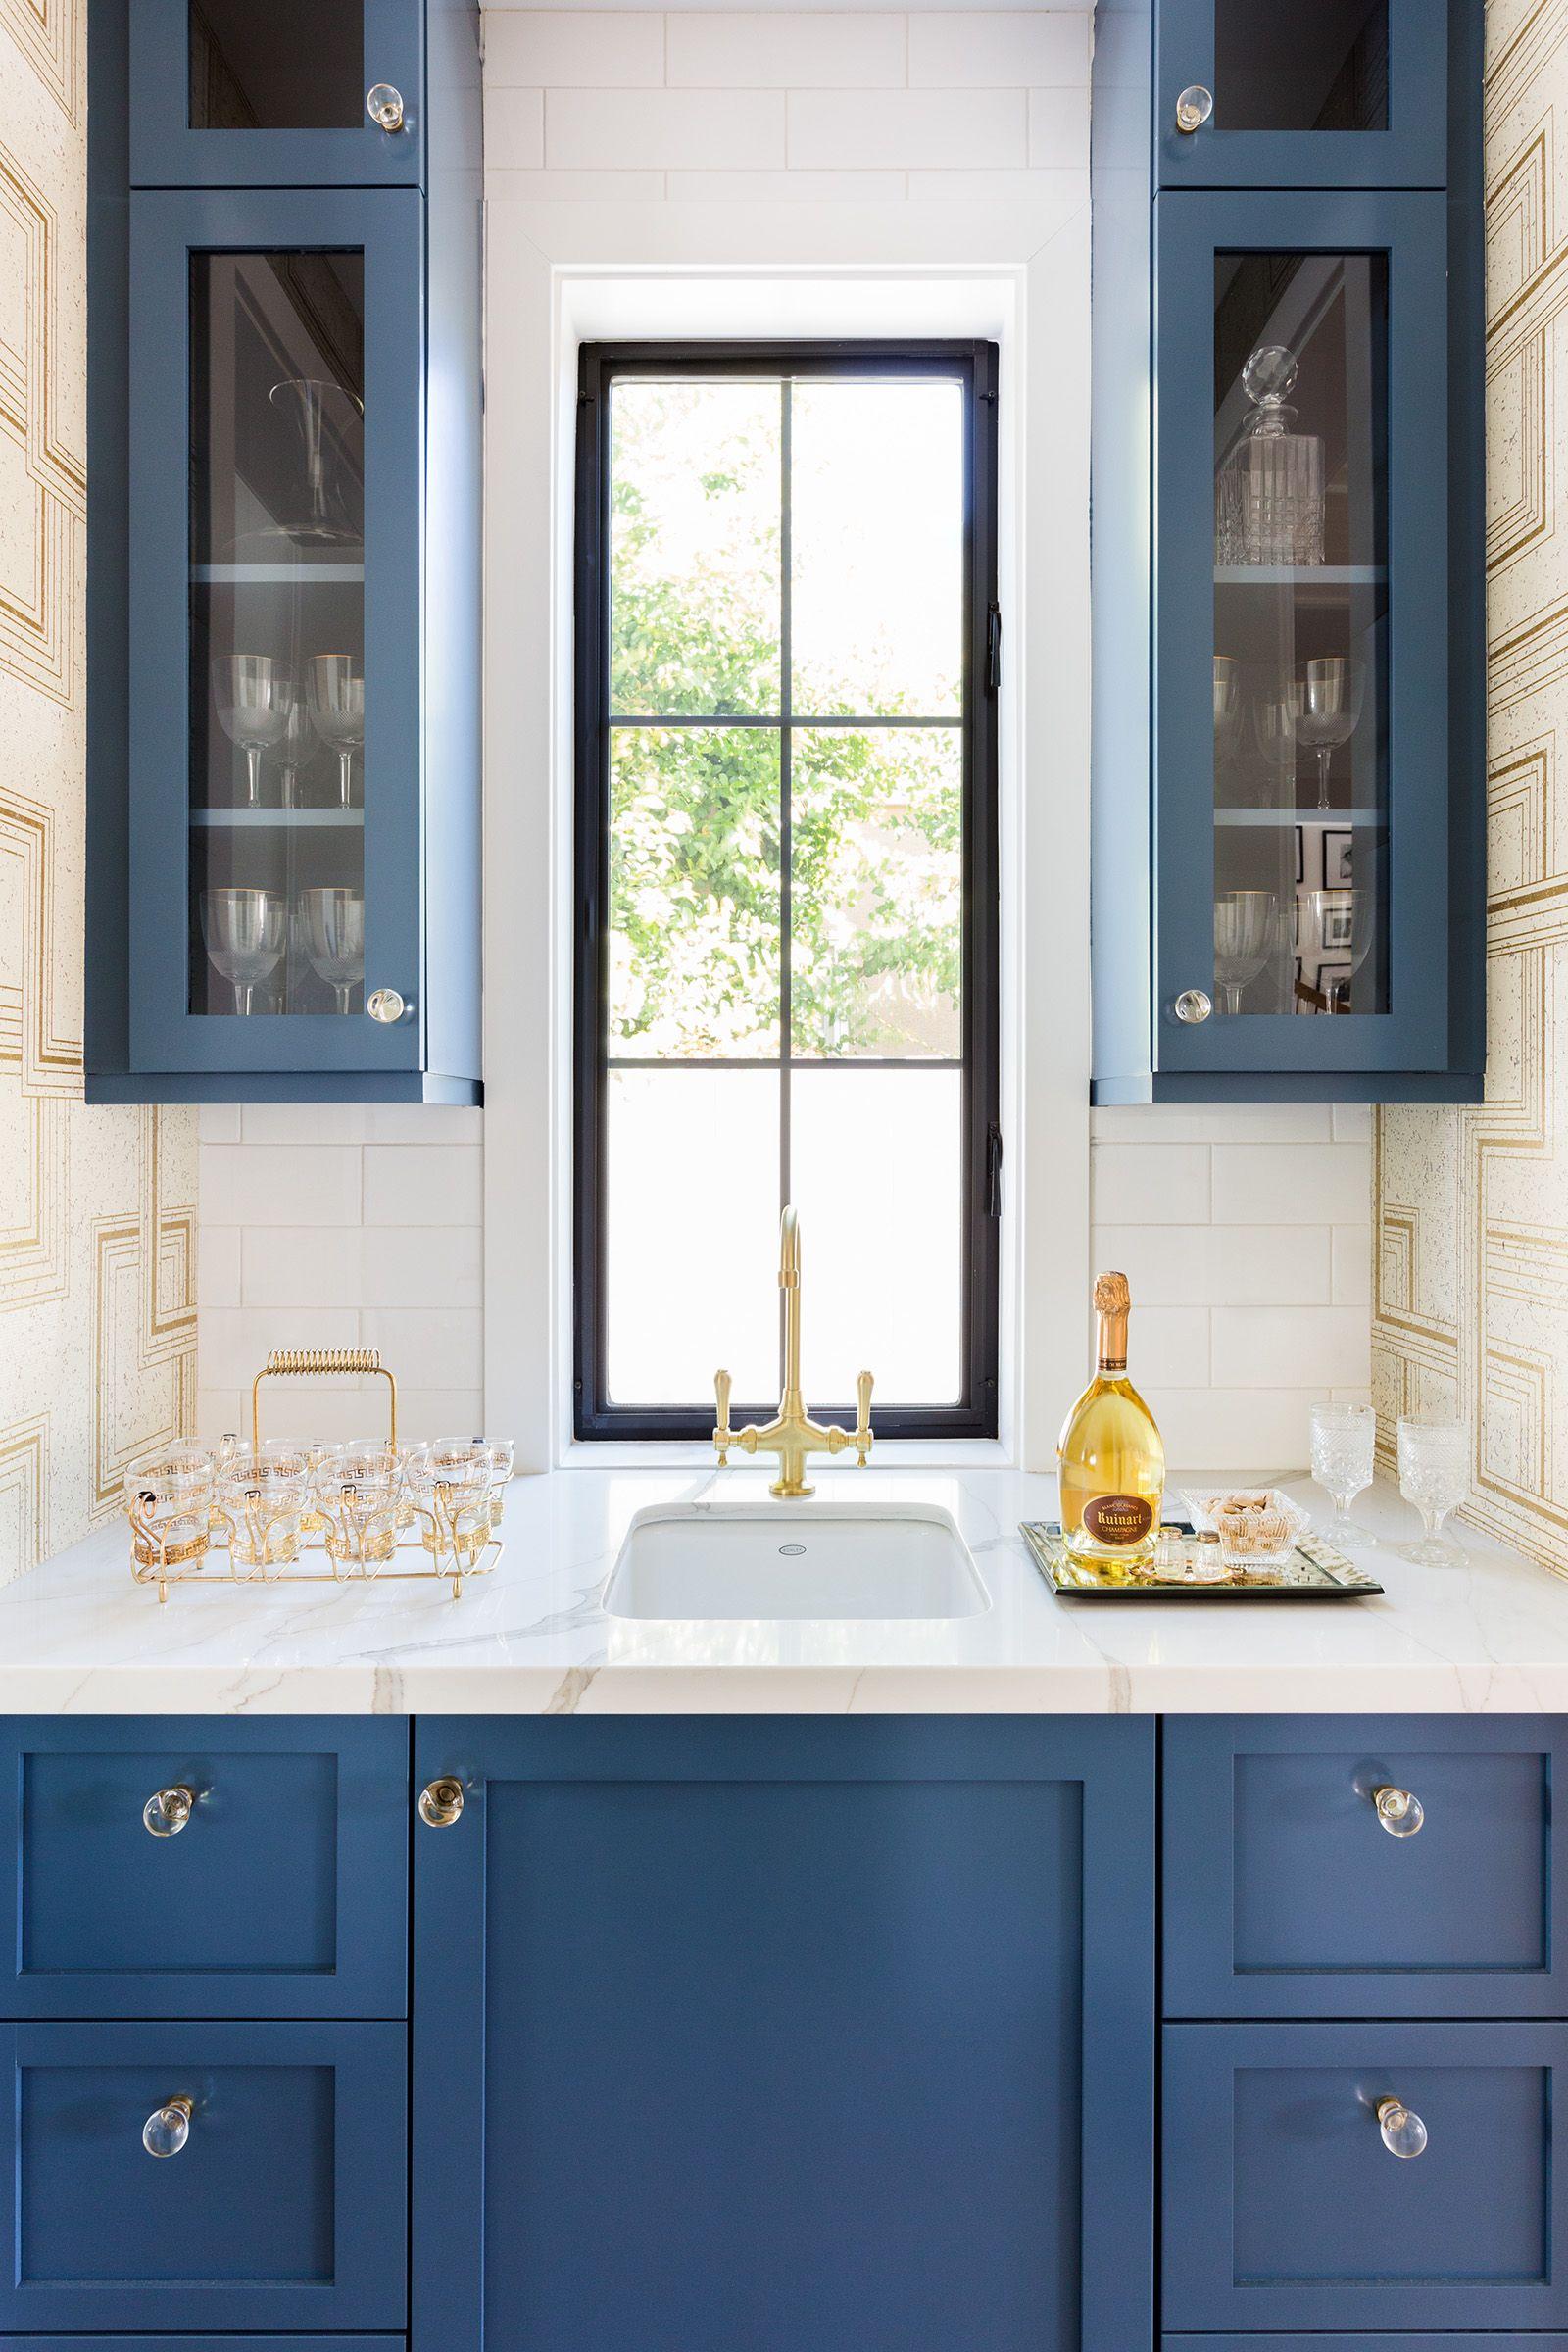 24 Best Home Bar Ideas - Cool Home Bar Designs, Furniture, and Decor